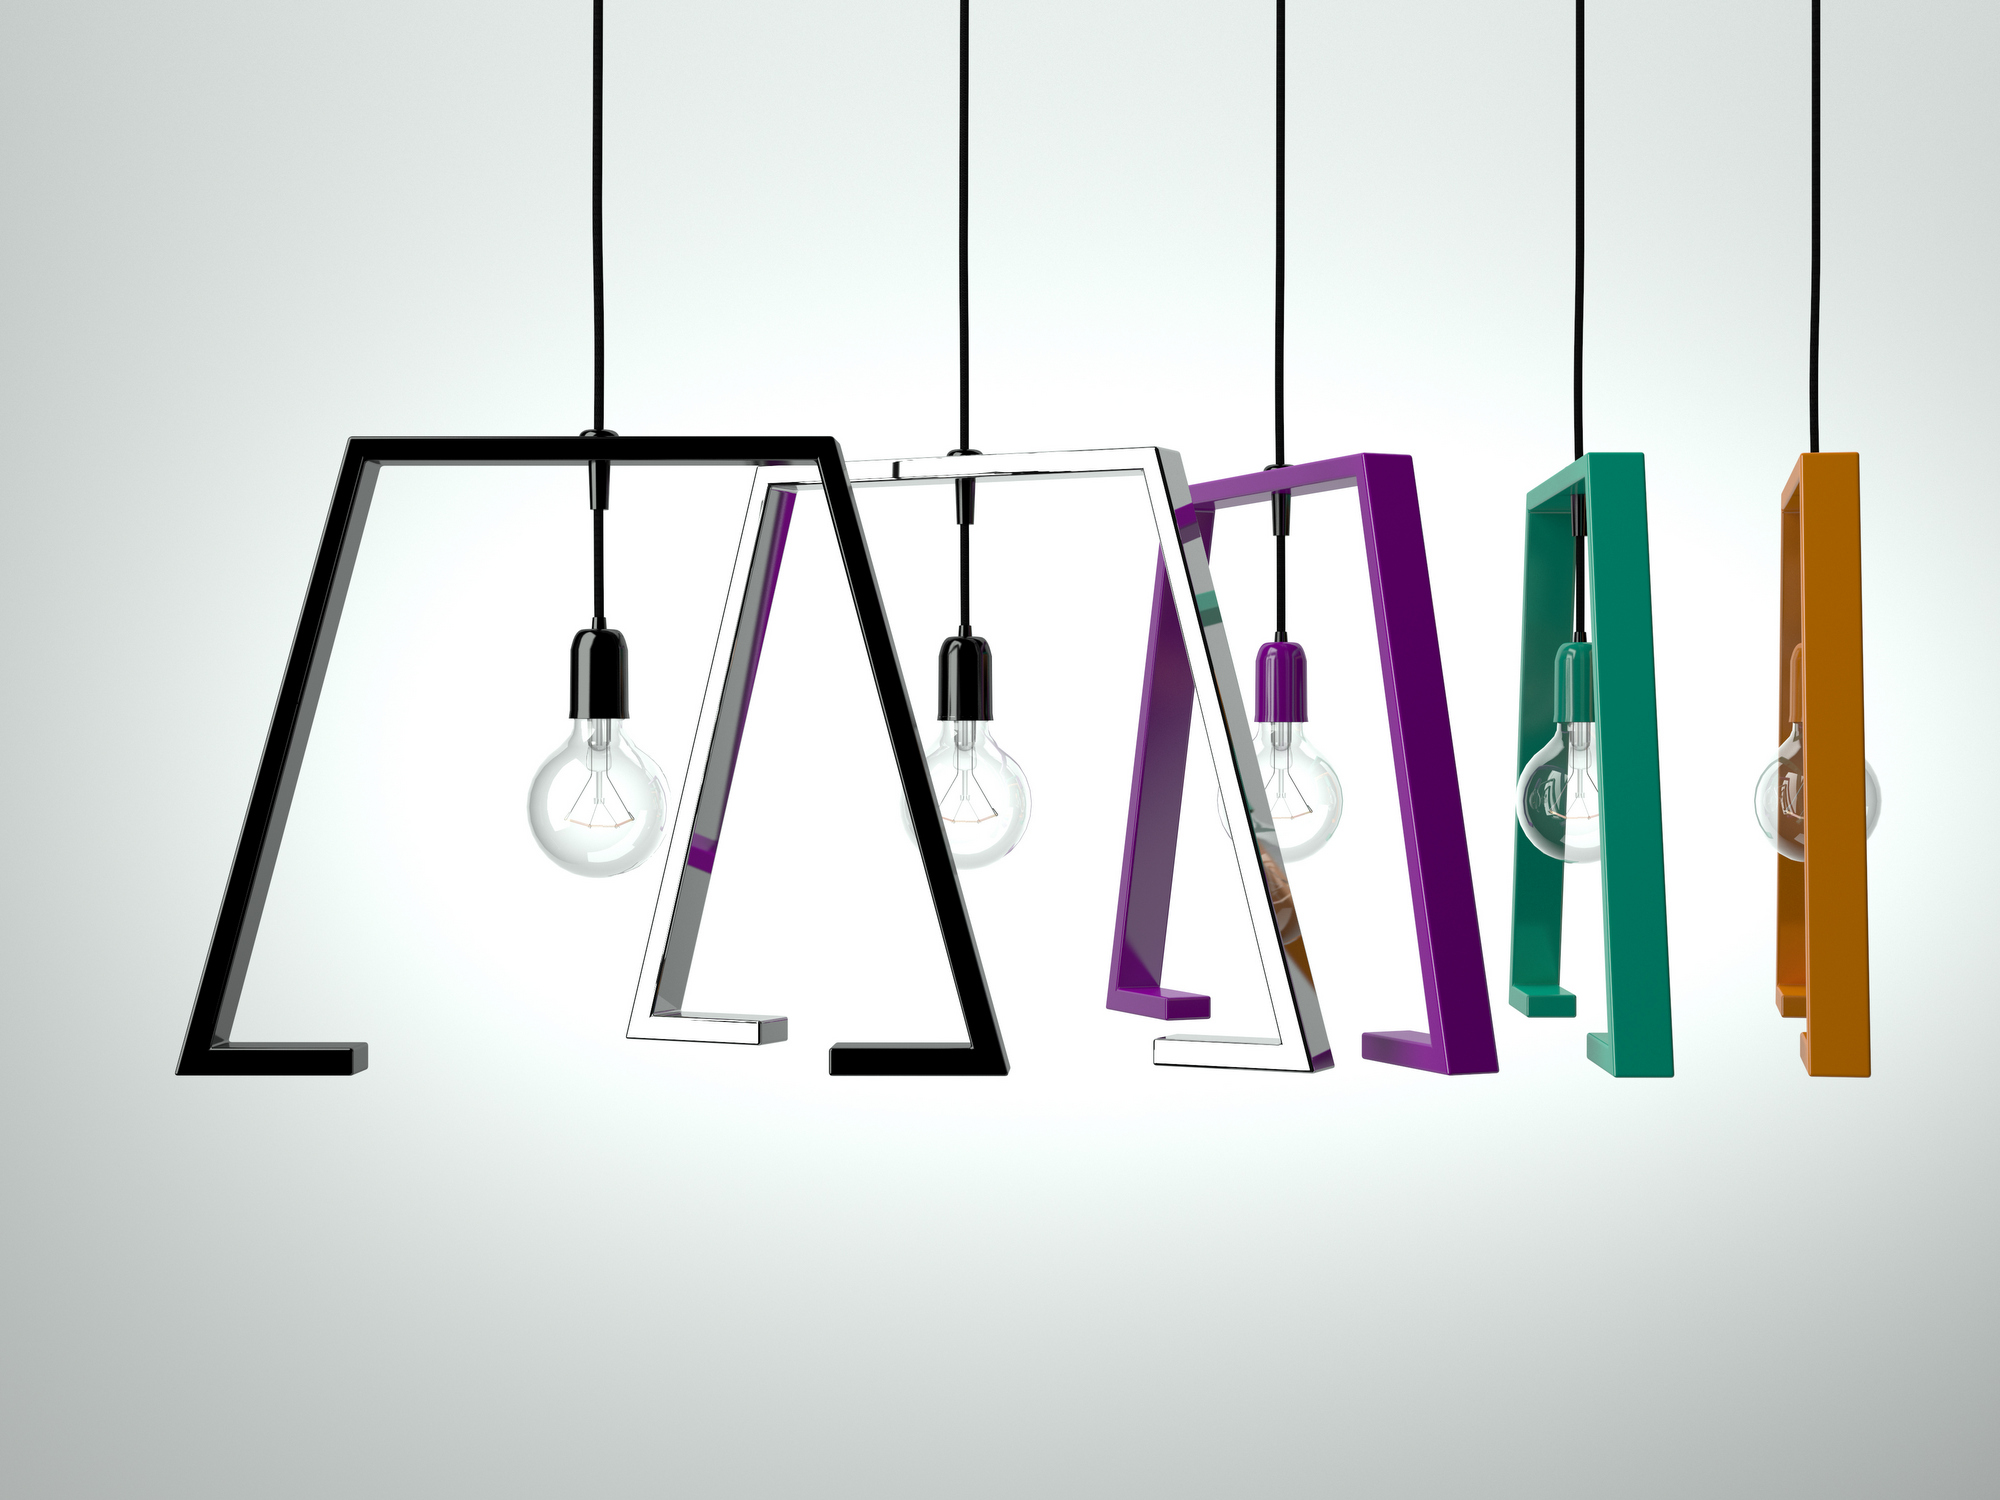 ... Berliner by Altinox Minimal Design design Sergio Cordero Álvarez